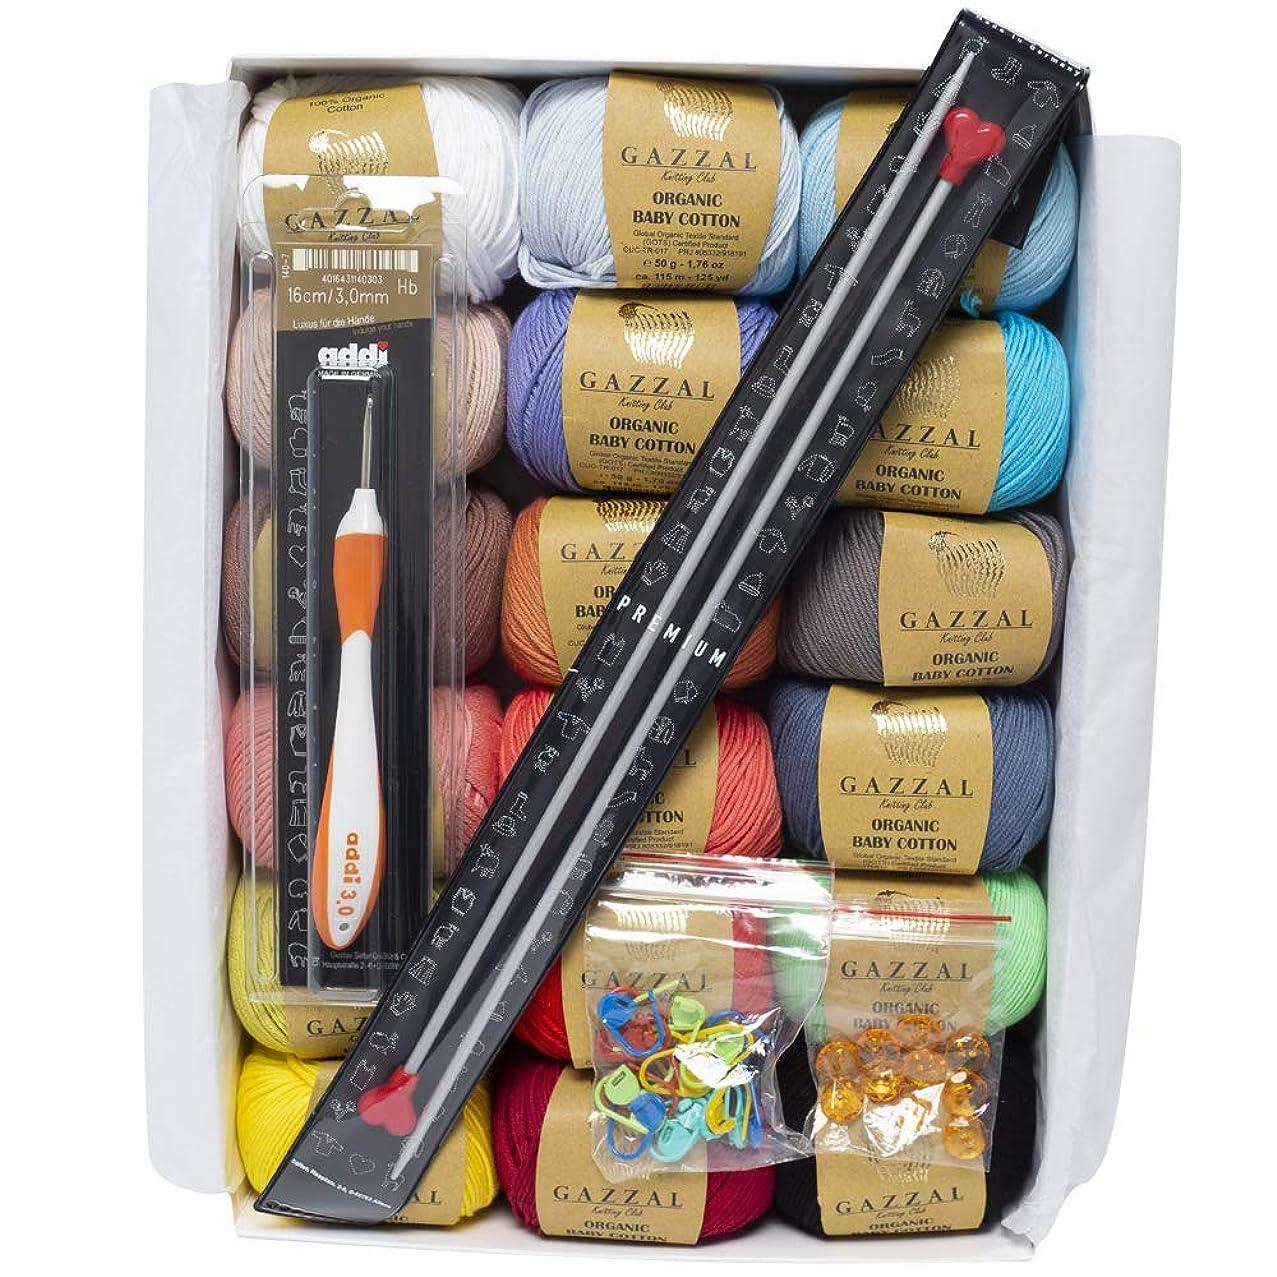 Gazzal Organic Baby Cotton Gift Set, 18 Balls of Assorted Colors, 100% Cotton, 1 Ball: 50g (1.76 oz)/115 m (125 yds), Yarn Weight: 3 Light-Dk